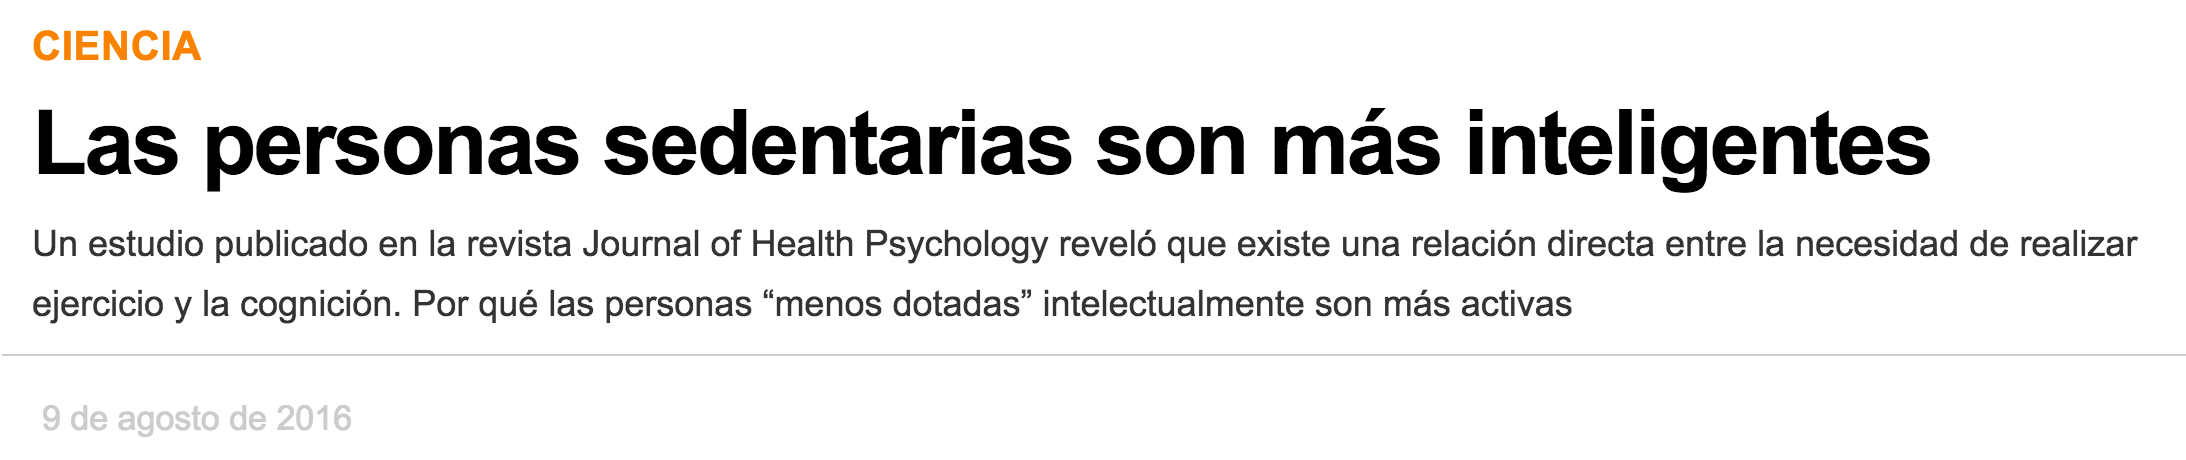 Marmotazos-inteligencia_14